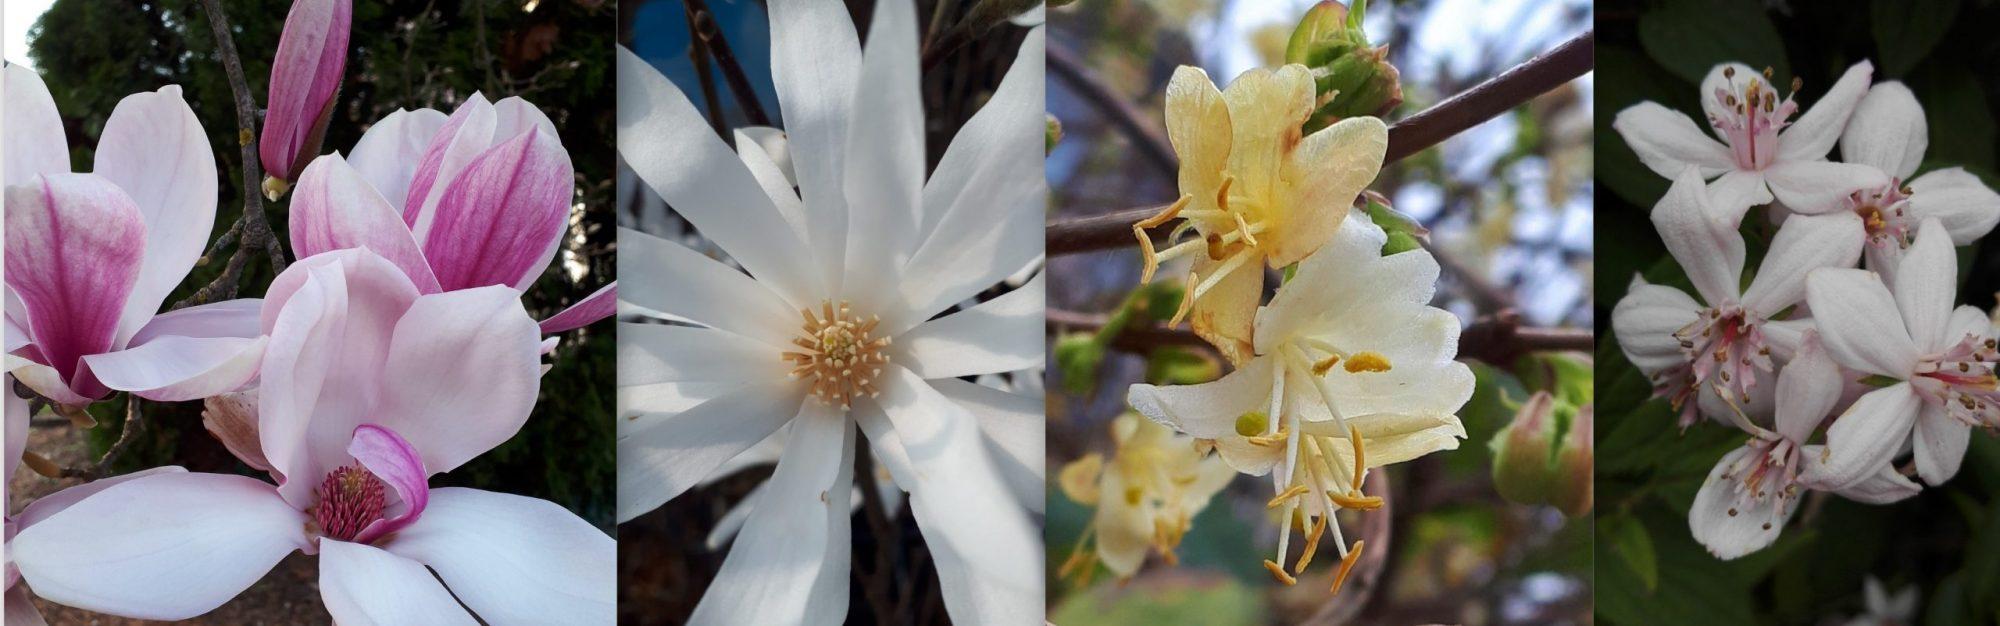 ARZENIAS Pflanzen